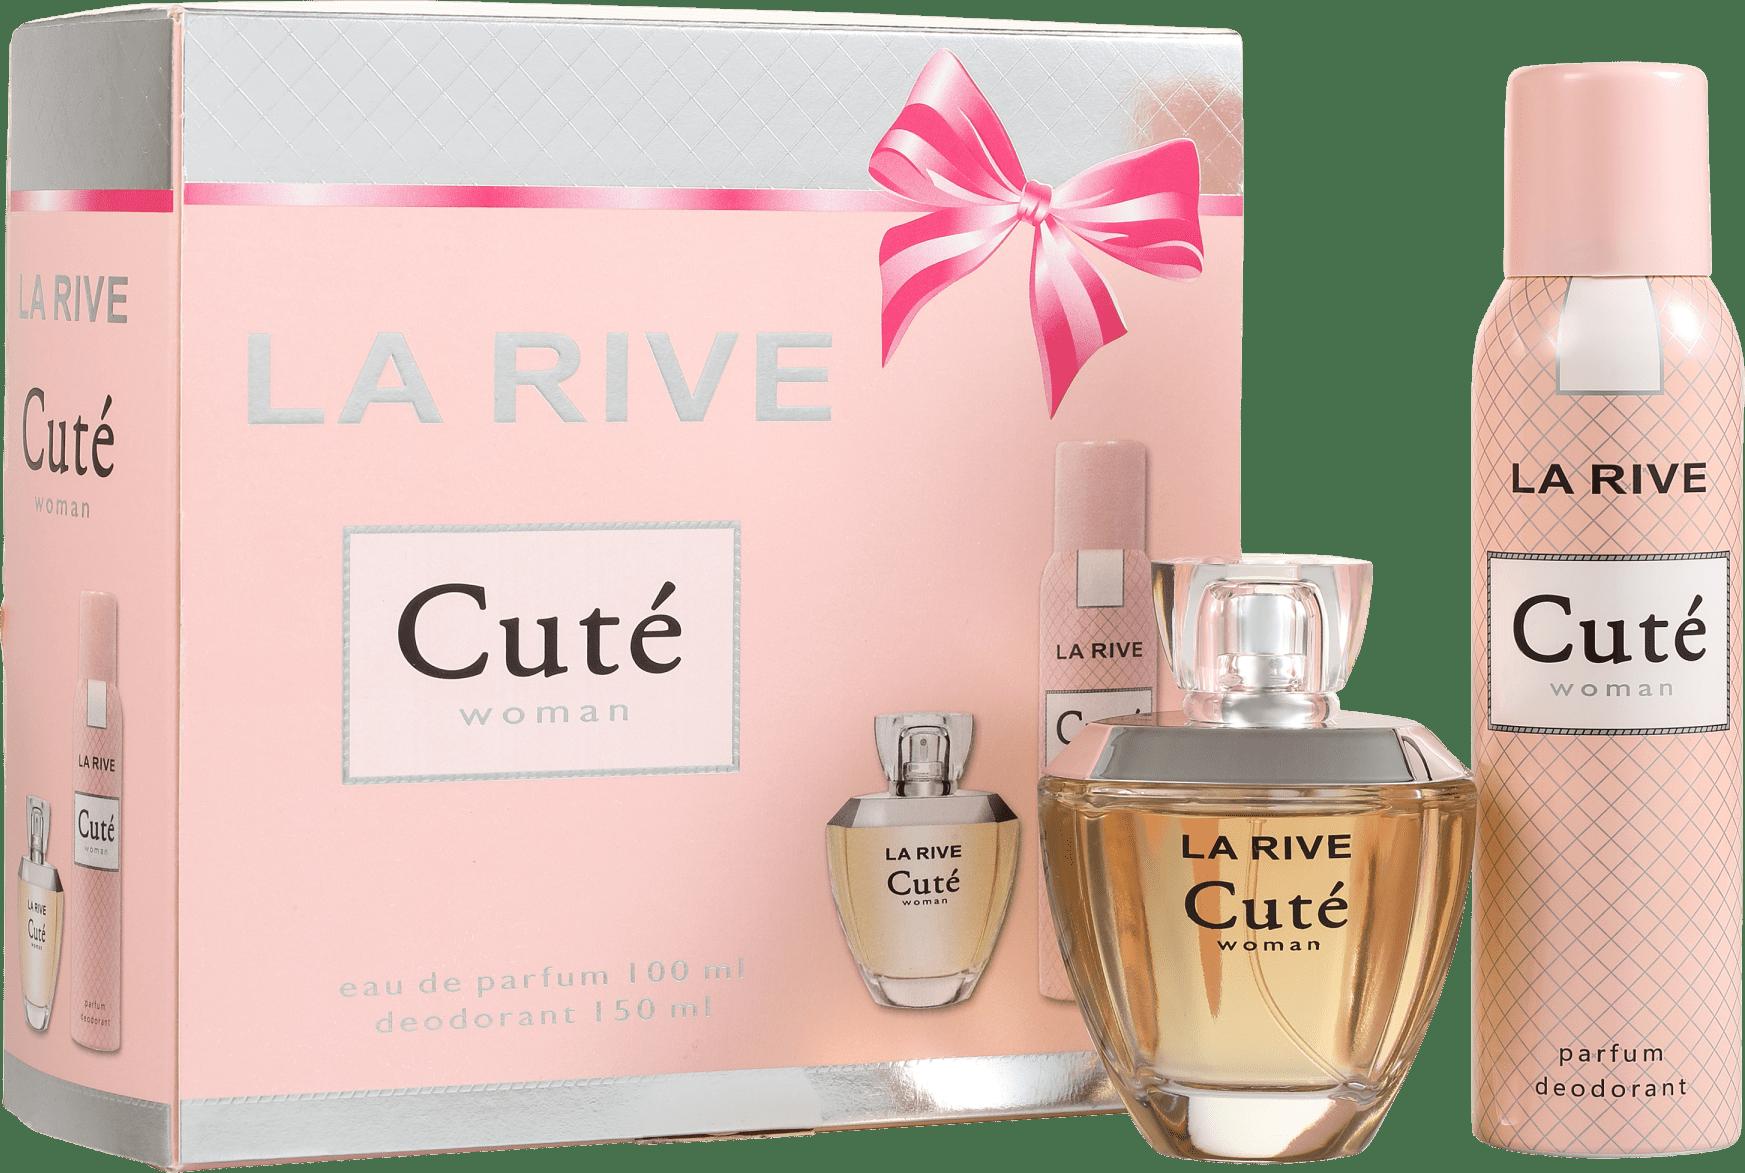 94a5d9c386 Conjunto Cuté La Rive Feminino - Eau de Toilette 100ml + Desodorante 150ml